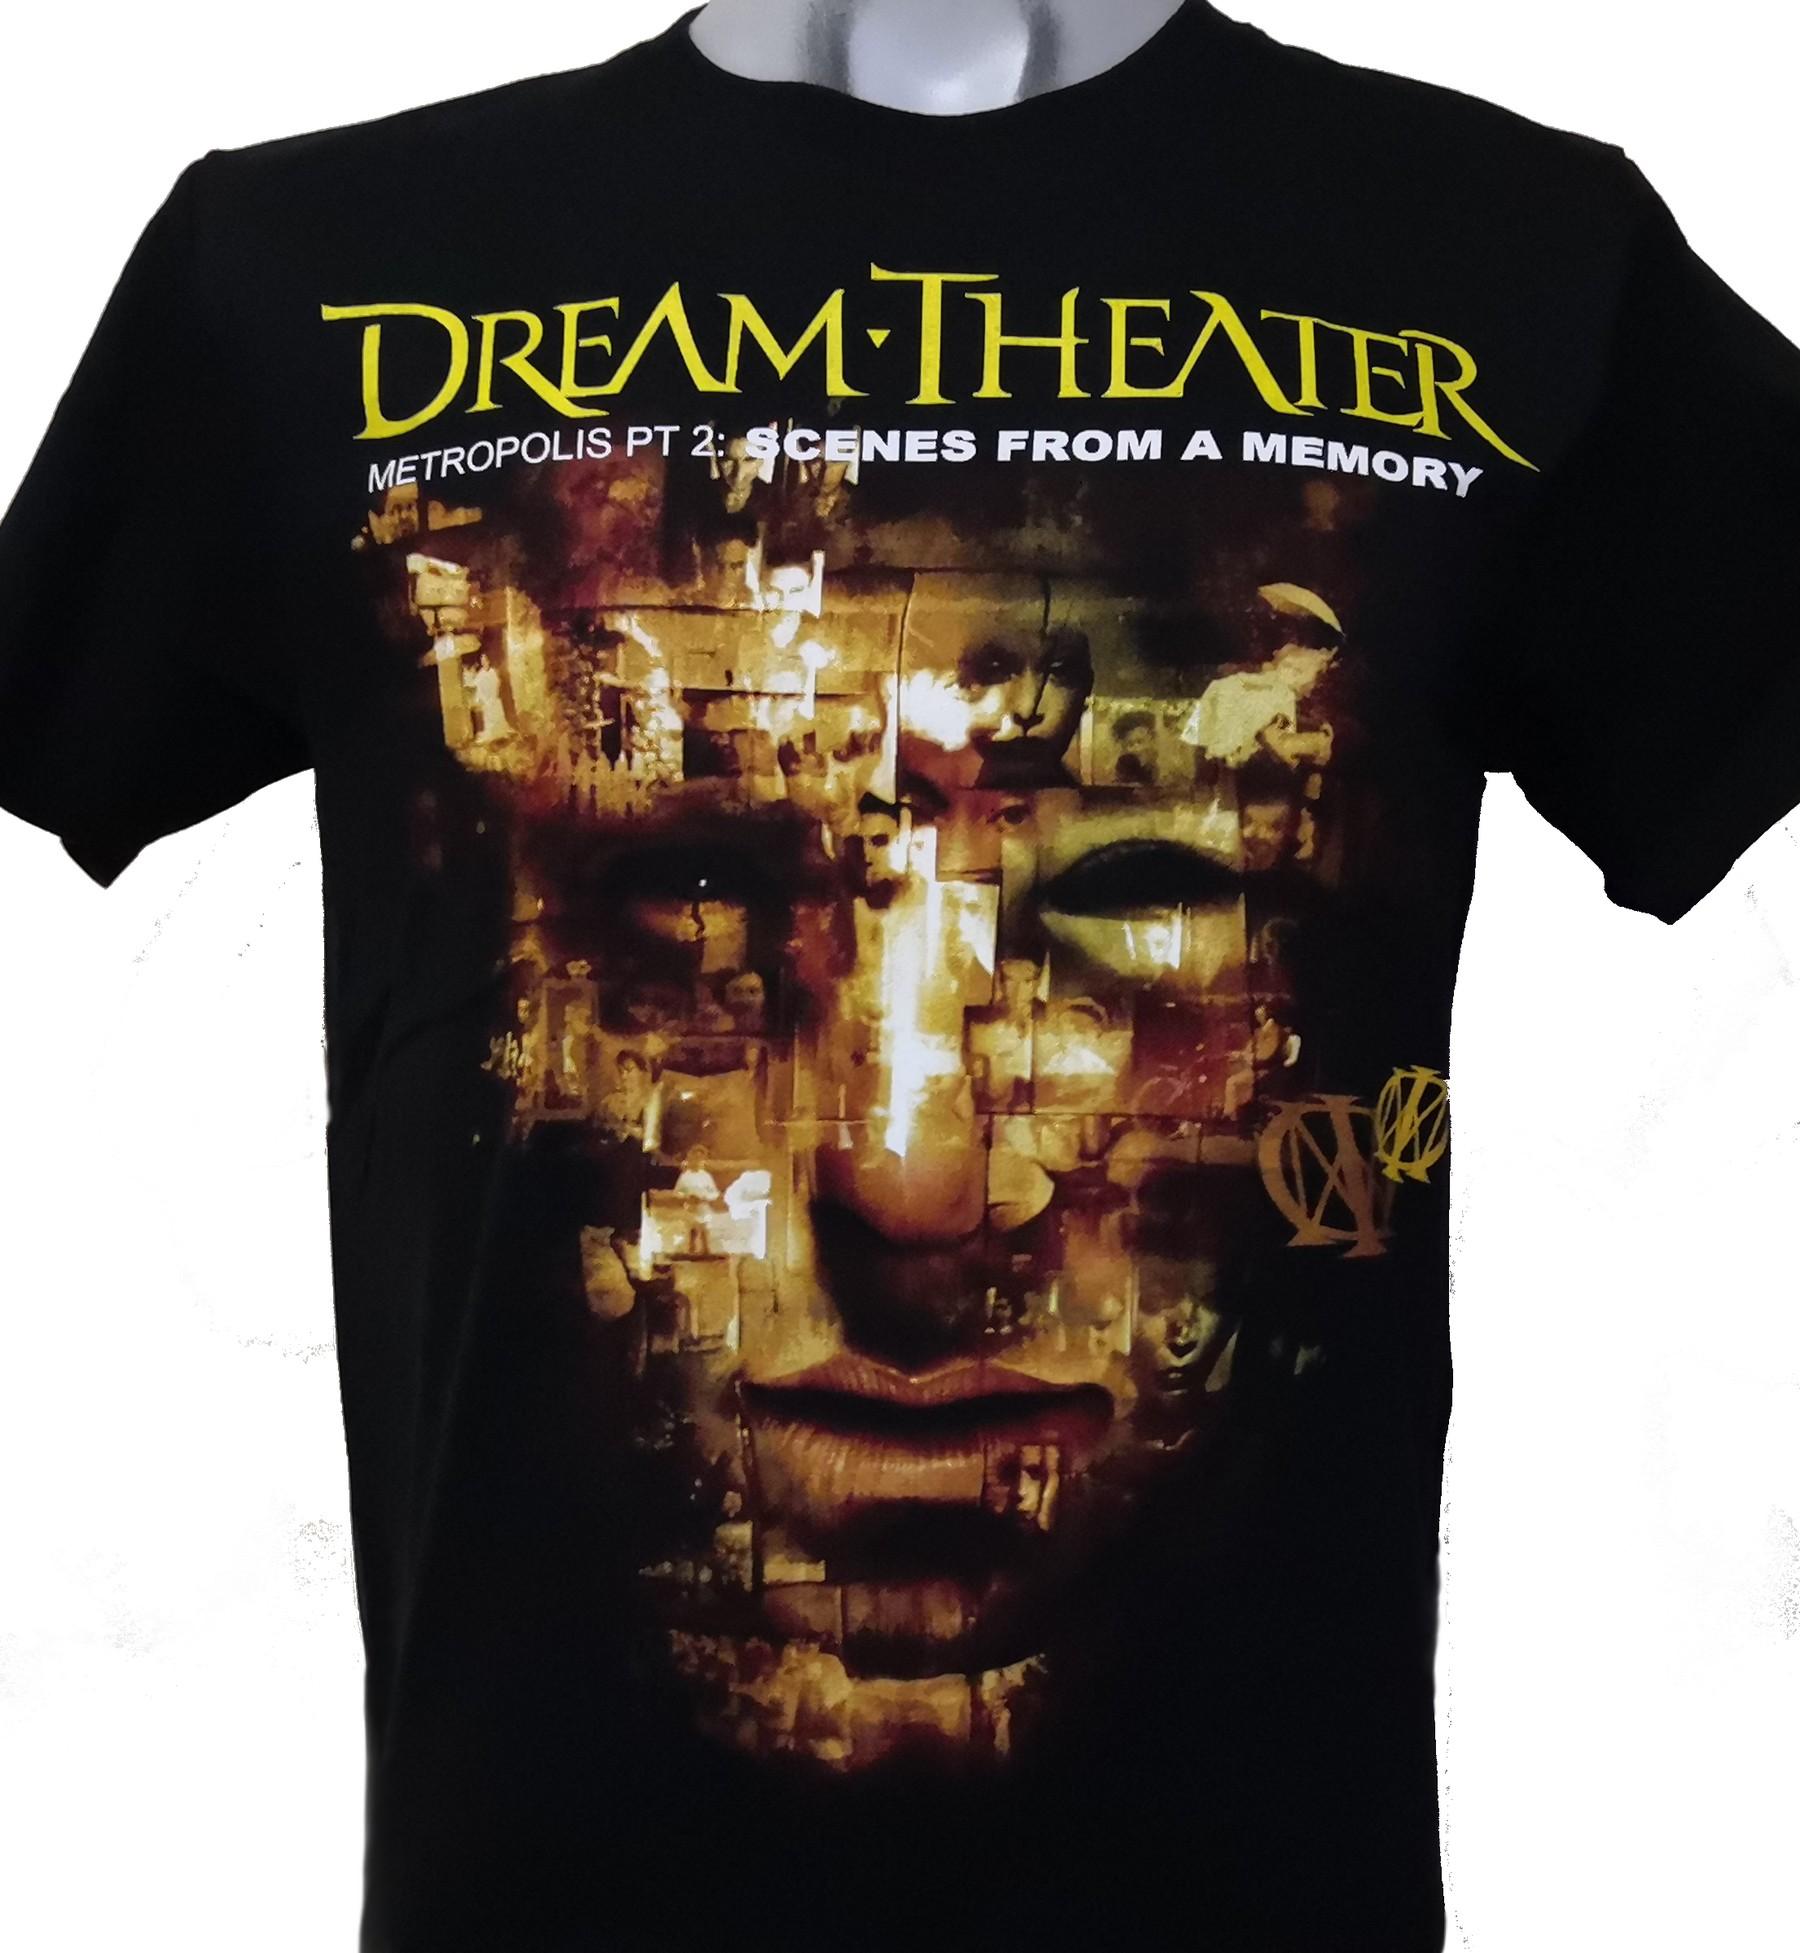 Dream Theater T Shirt Metropolis Pt 2 Scenes From A Memory Size M Roxxbkk